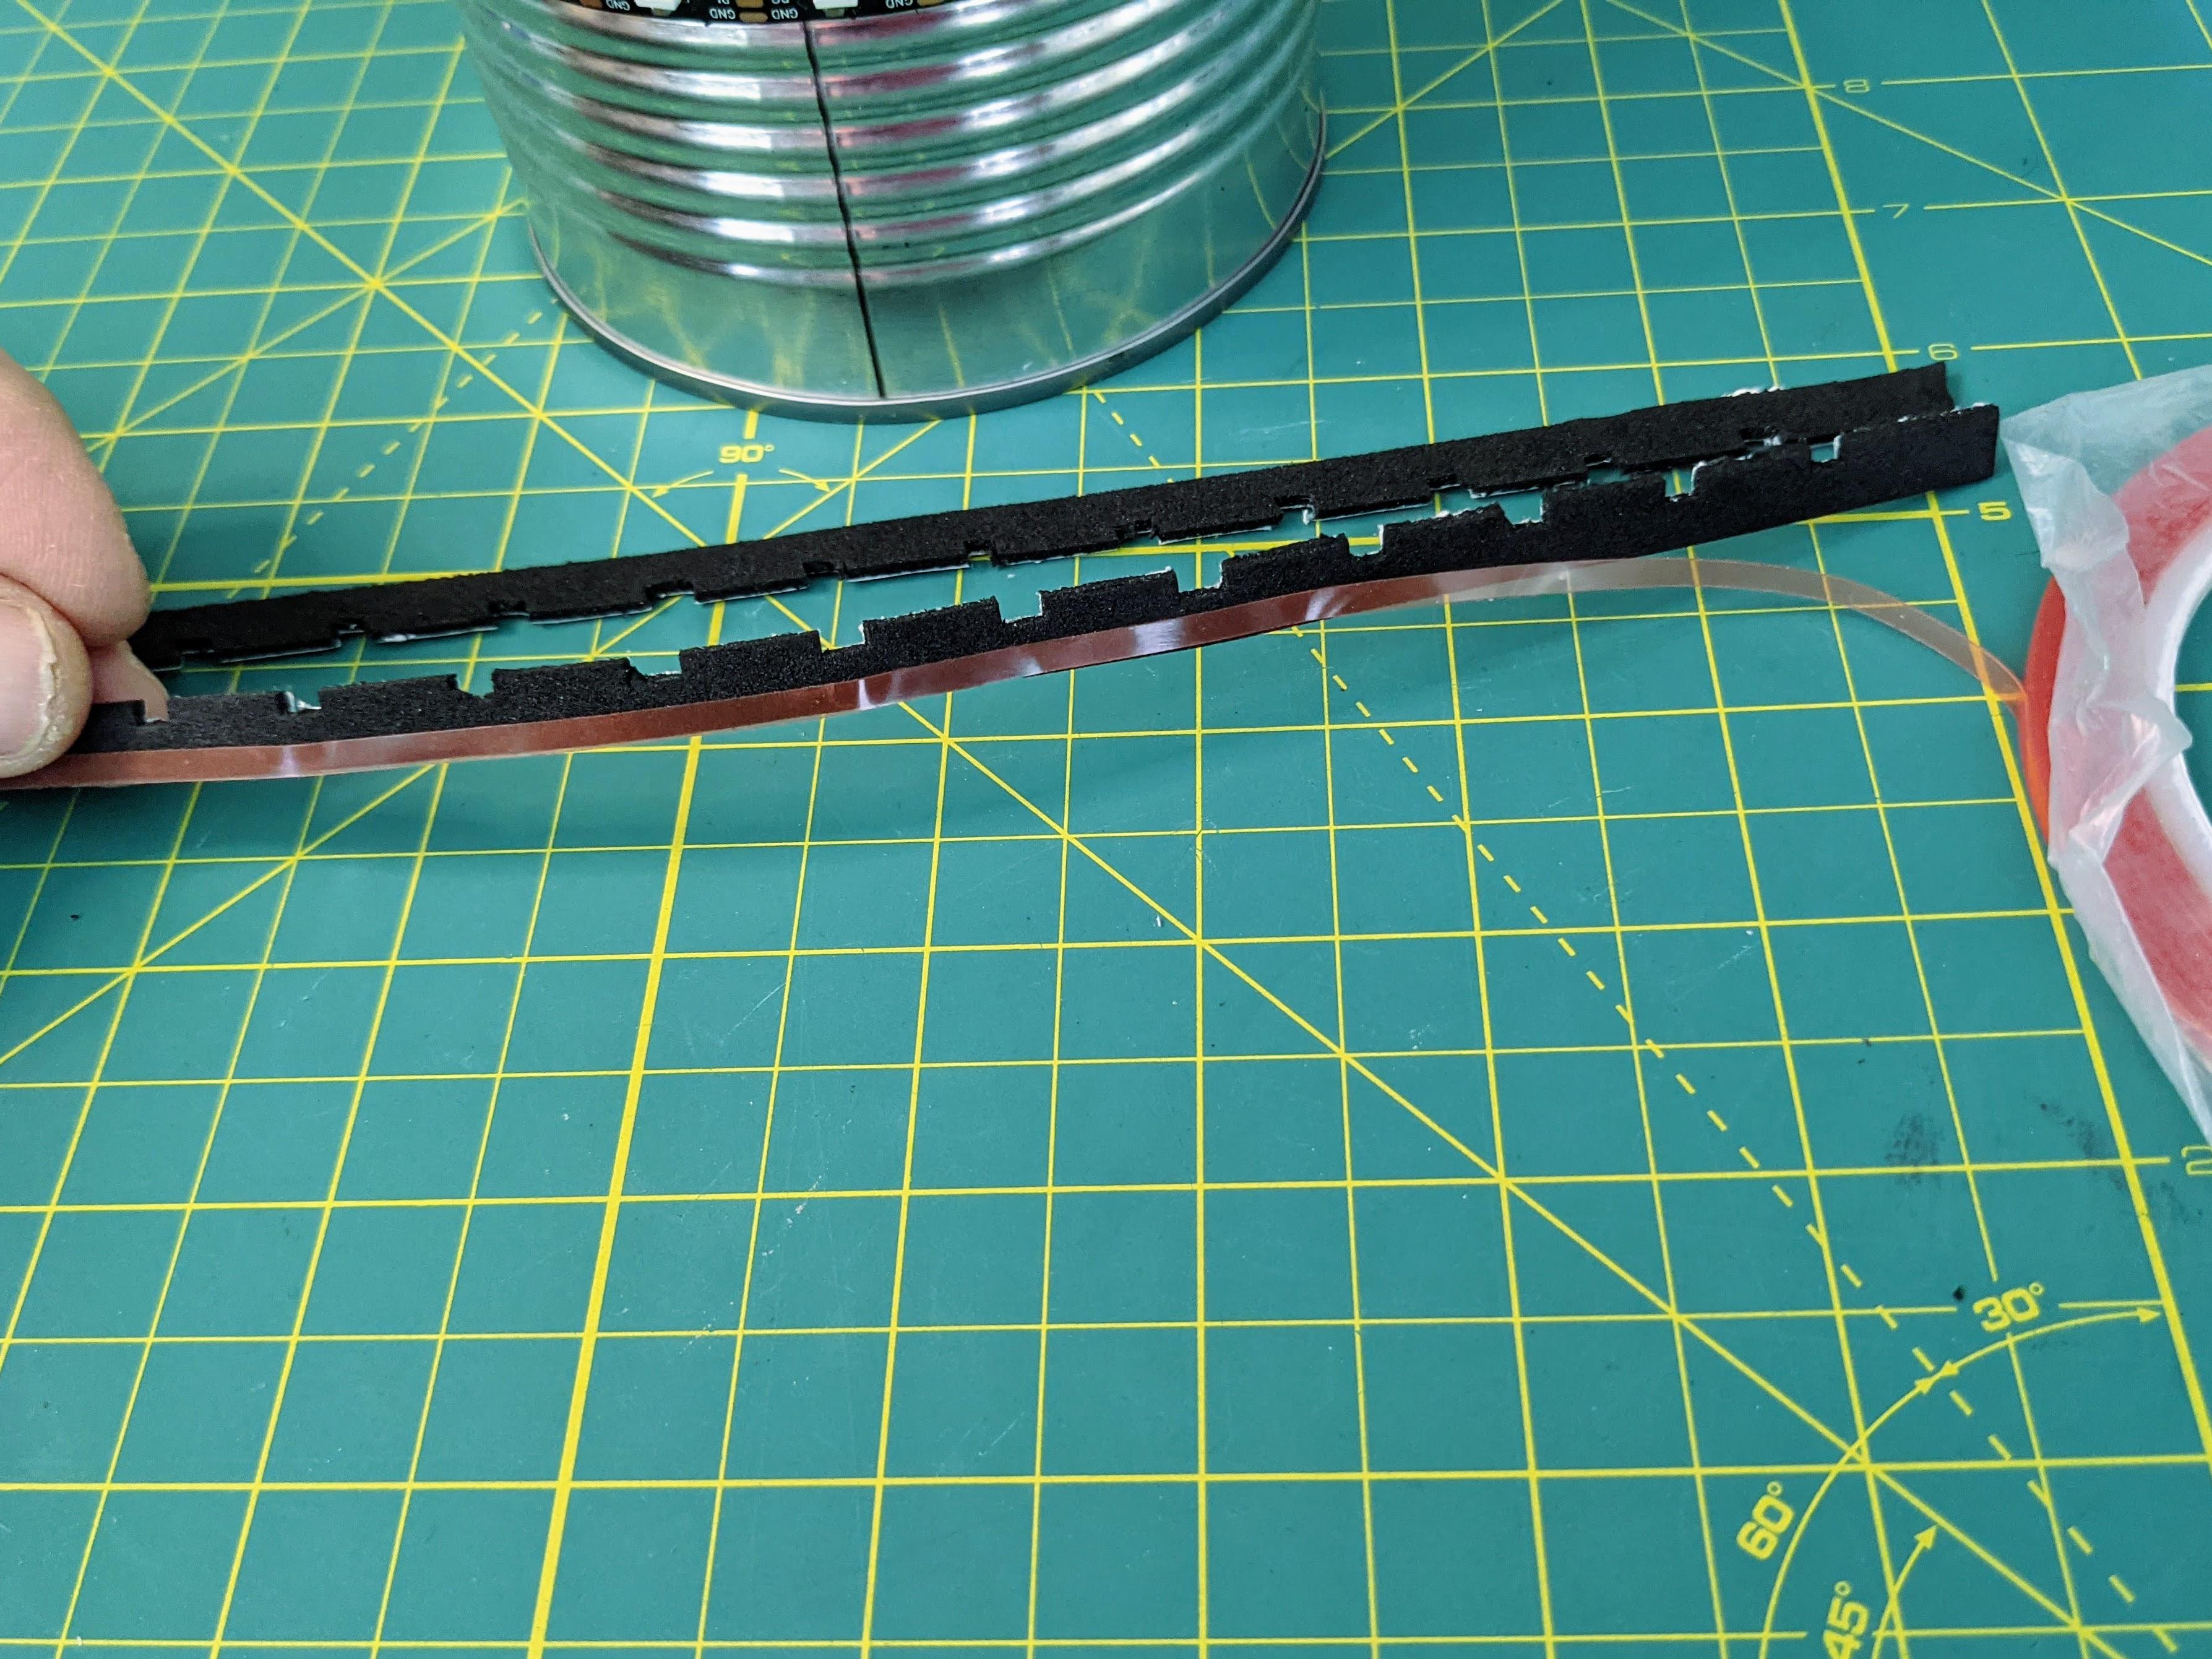 led_strips_PXL_20210125_193345765.MP_(1).jpg